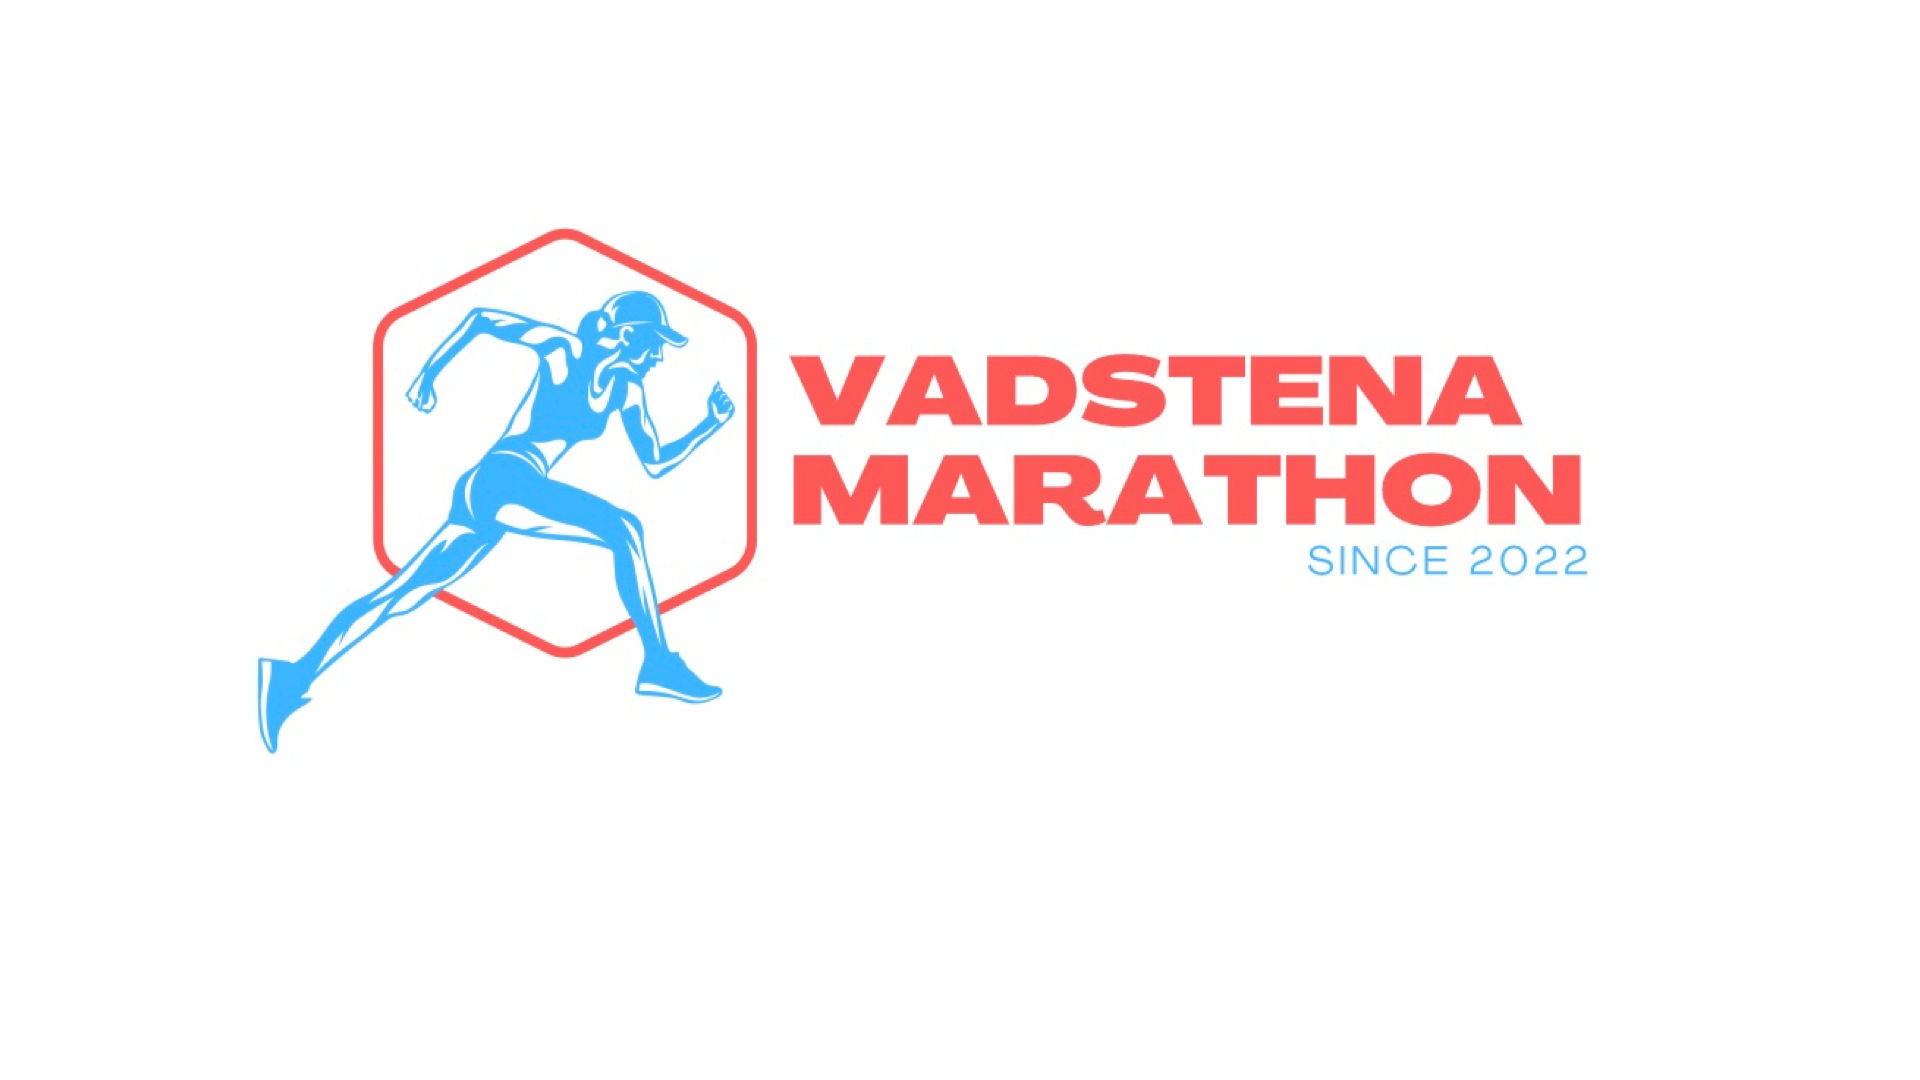 Vadstena Marathon